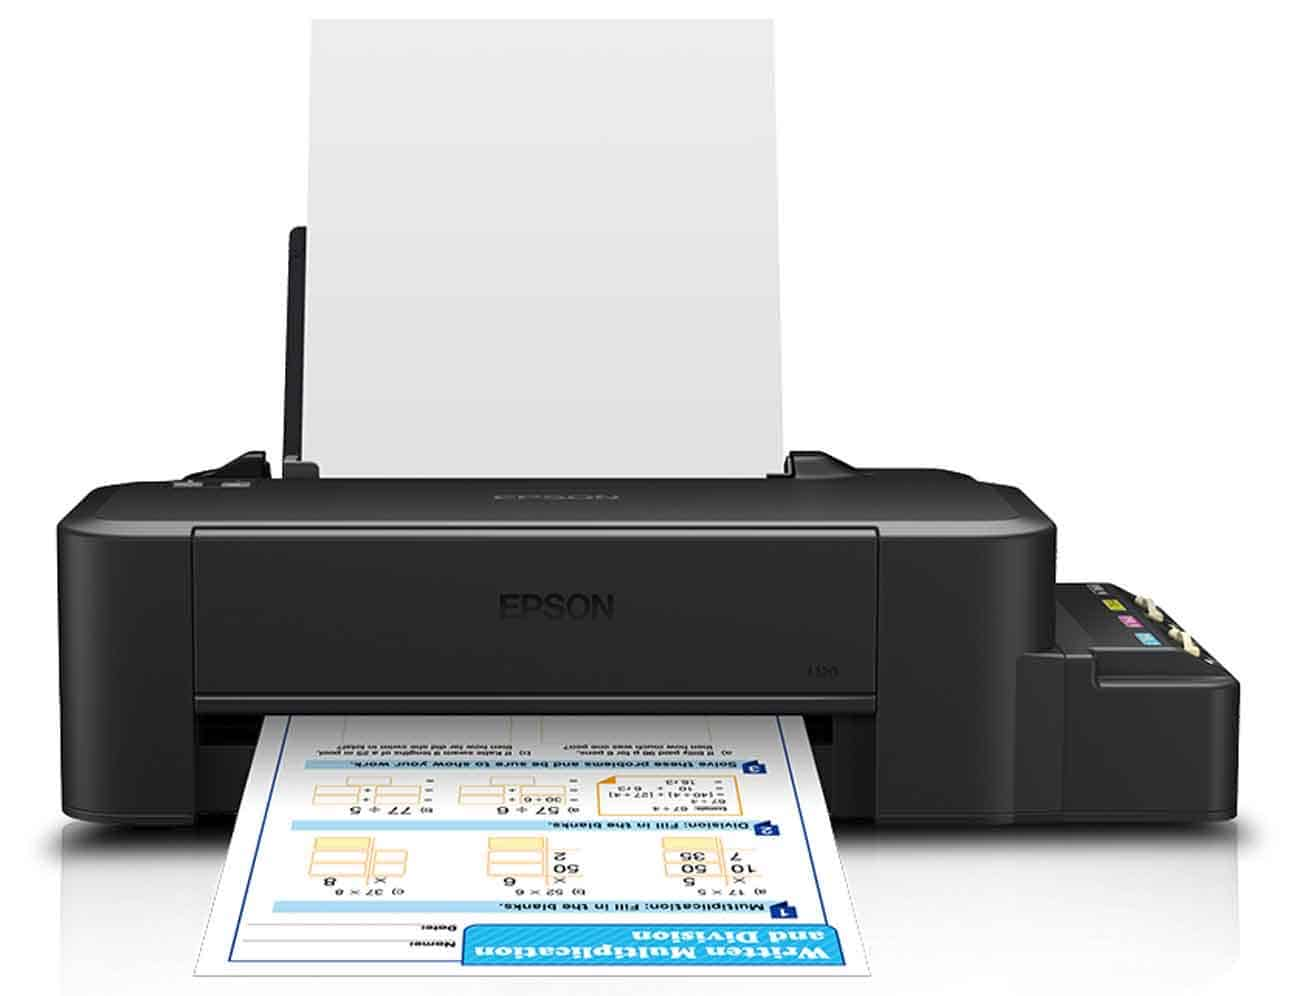 EpsonˇˇL120-Ink-Tank-Printer